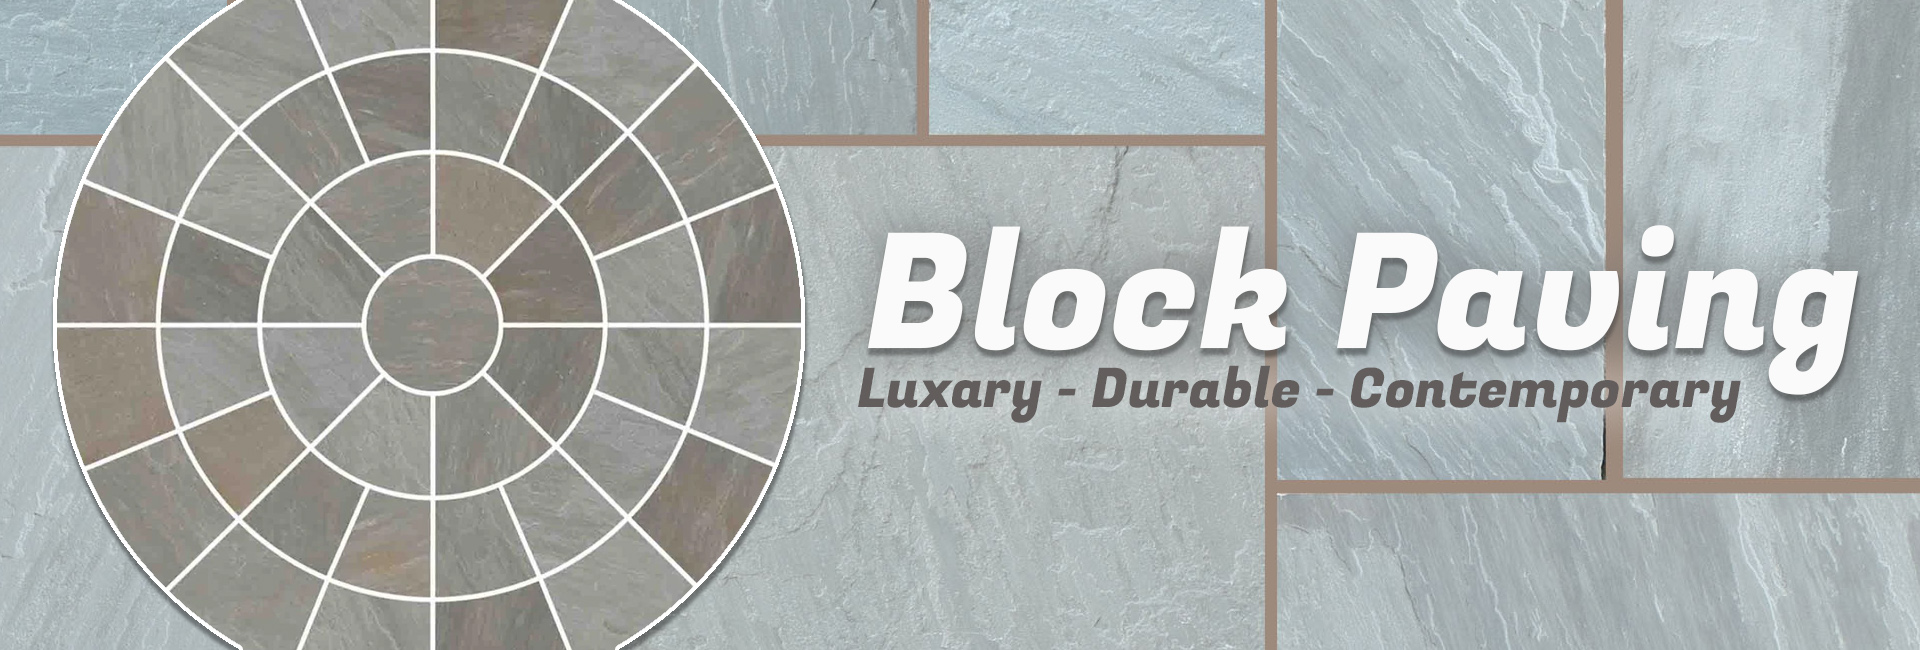 Bricks & Blocks in the Nottingham area